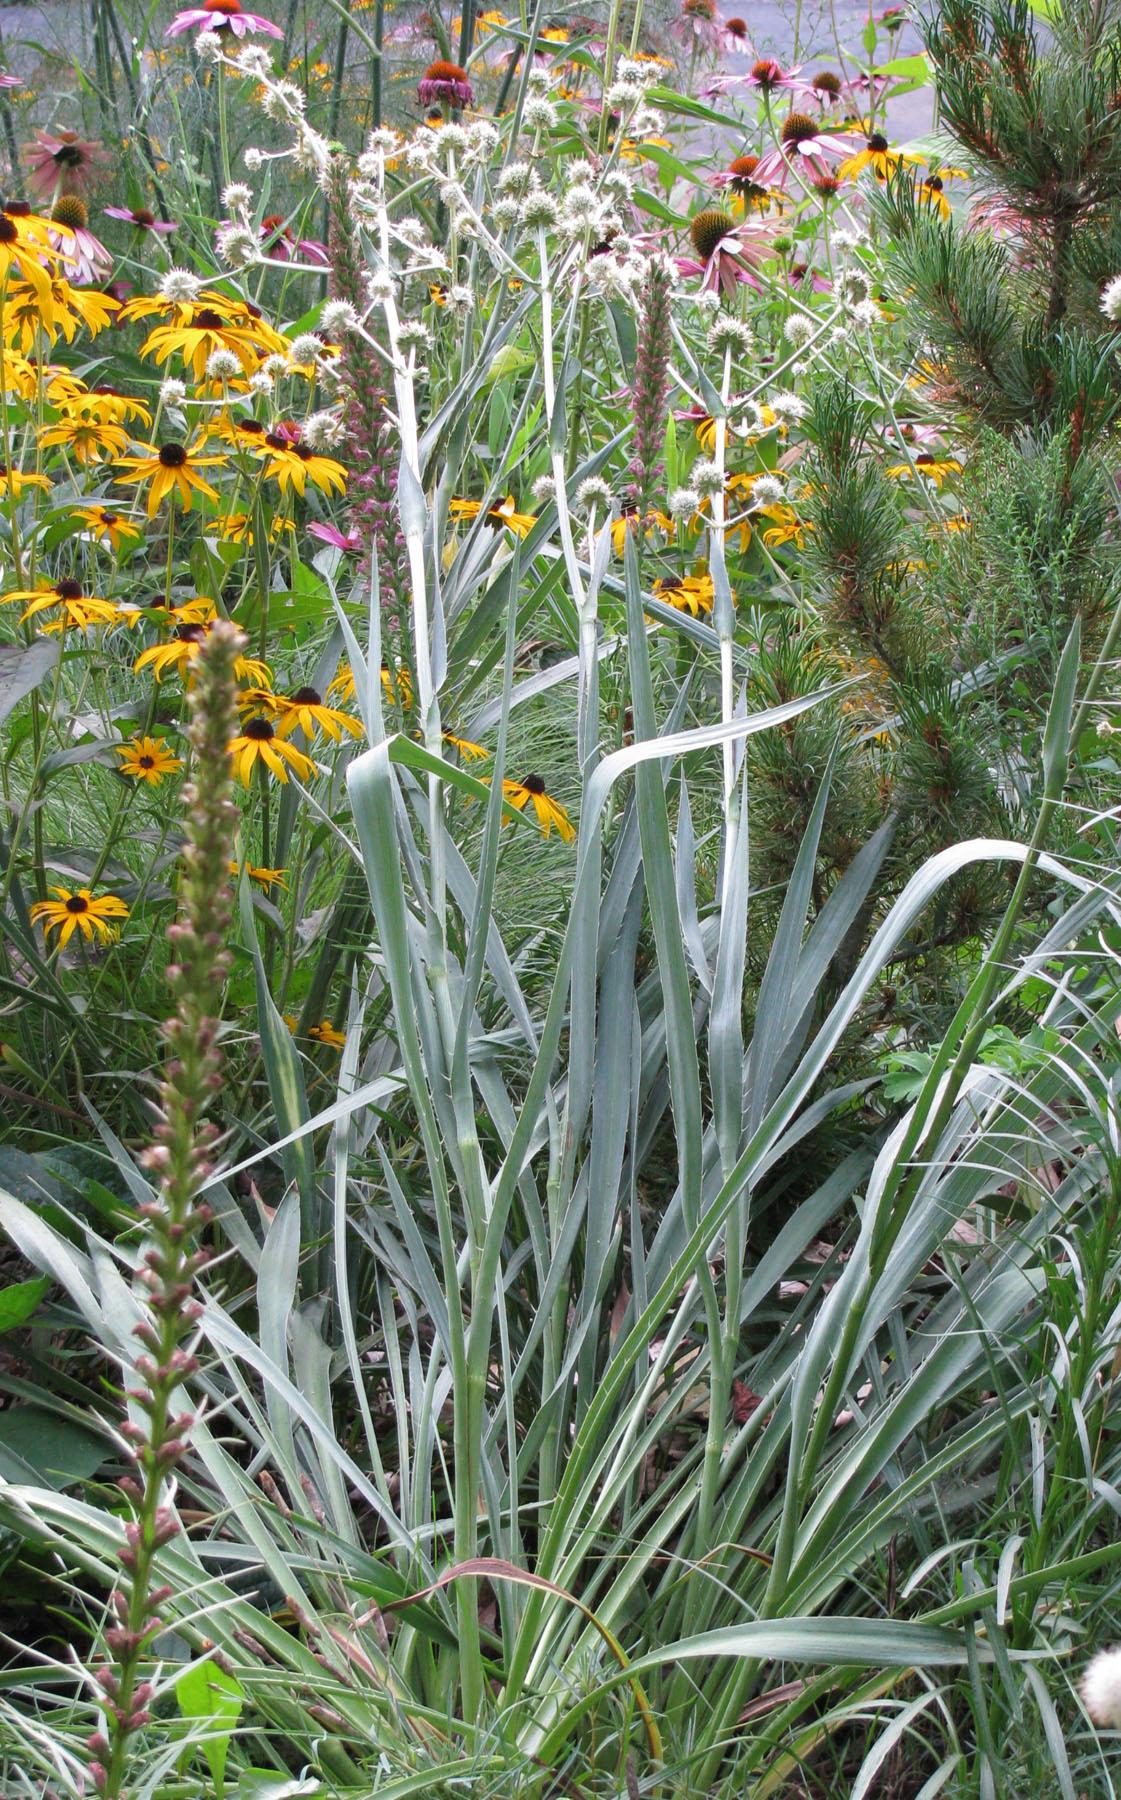 Eryngium yuccifolium lvs Knapke 8-10-09 resize